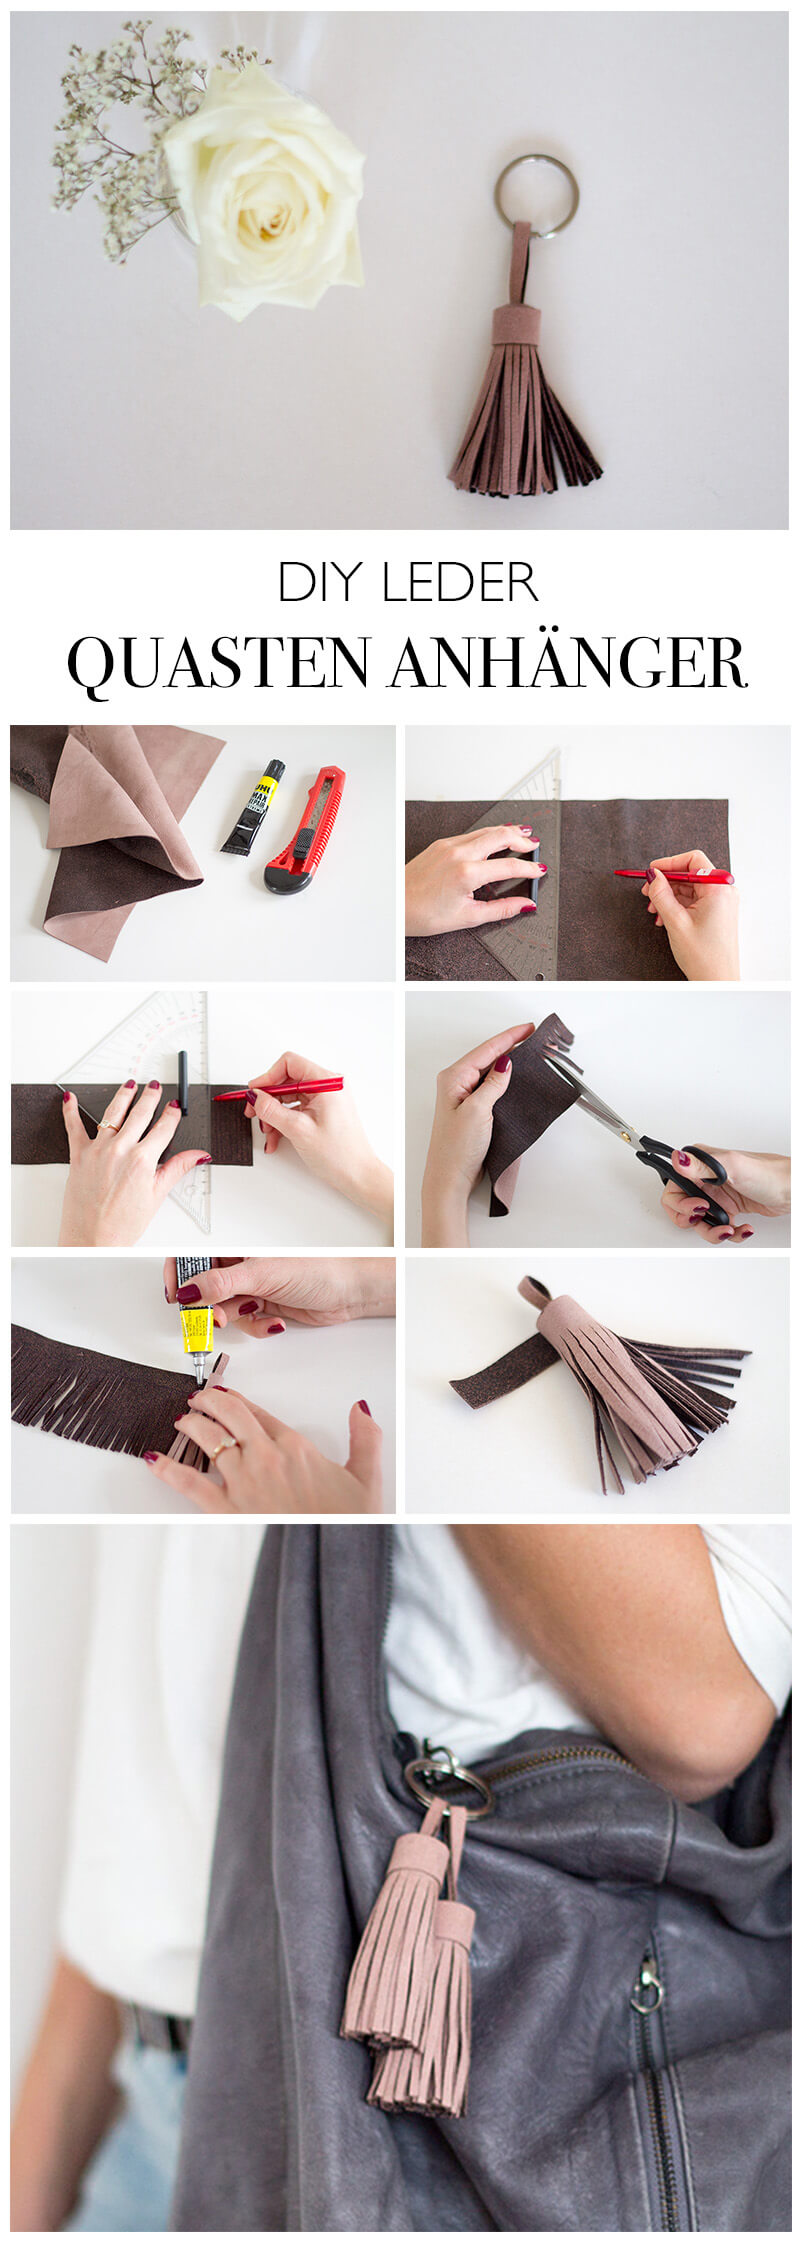 DIY LEDER QUASTEN ANHAENGER basteln - Geschenke selber machen - DIY Blog lindaloves.de